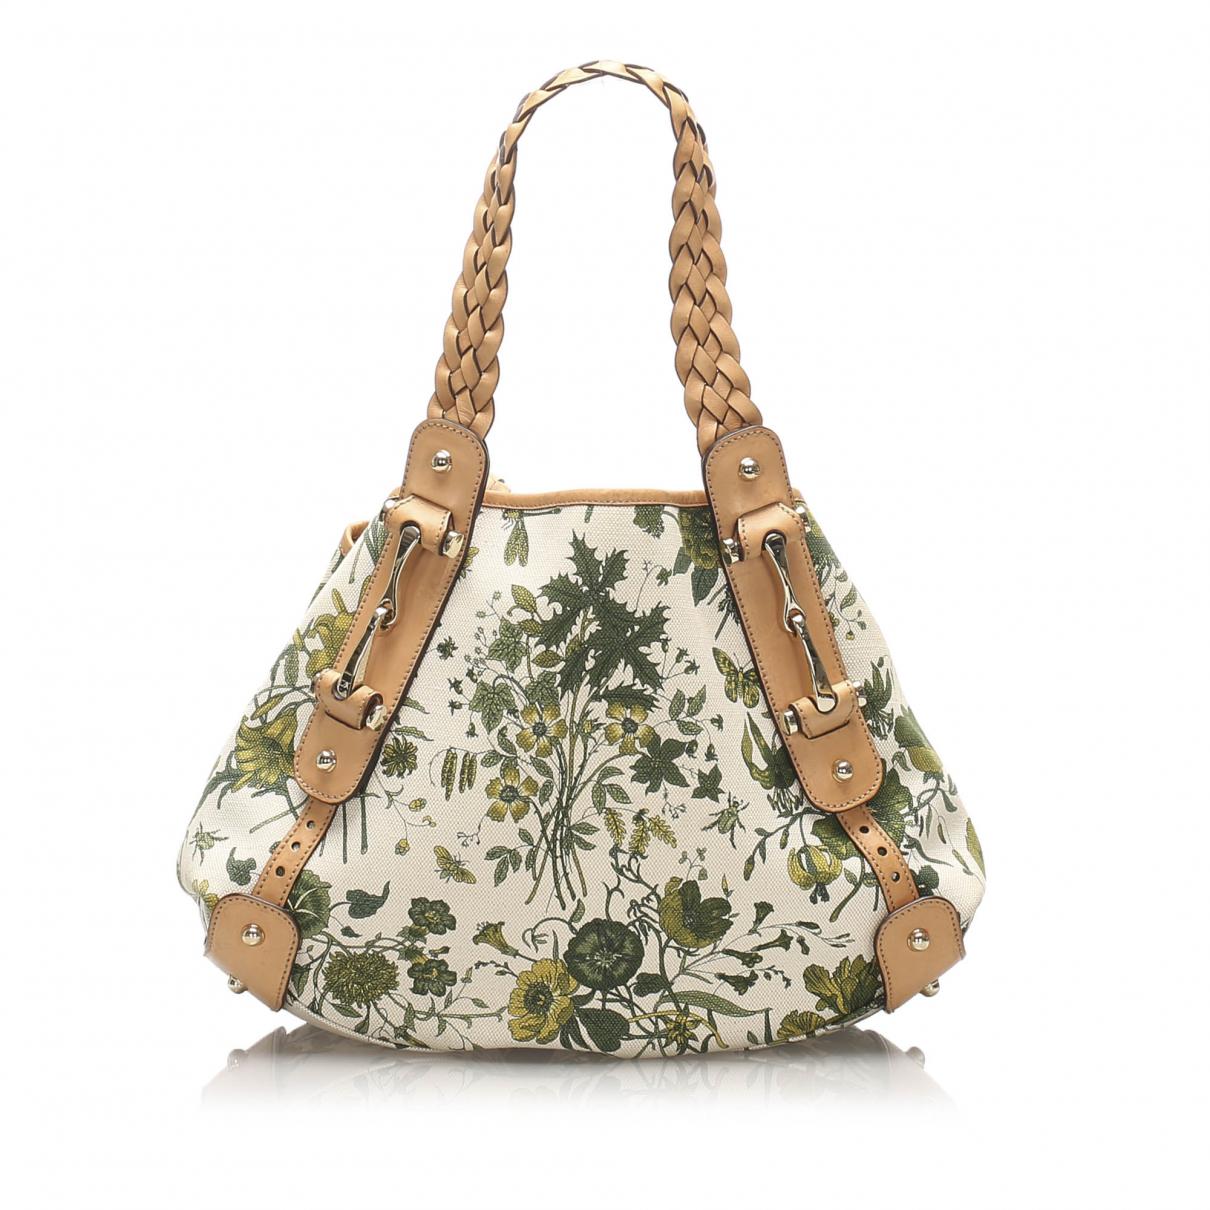 Gucci N White Cloth handbag for Women N